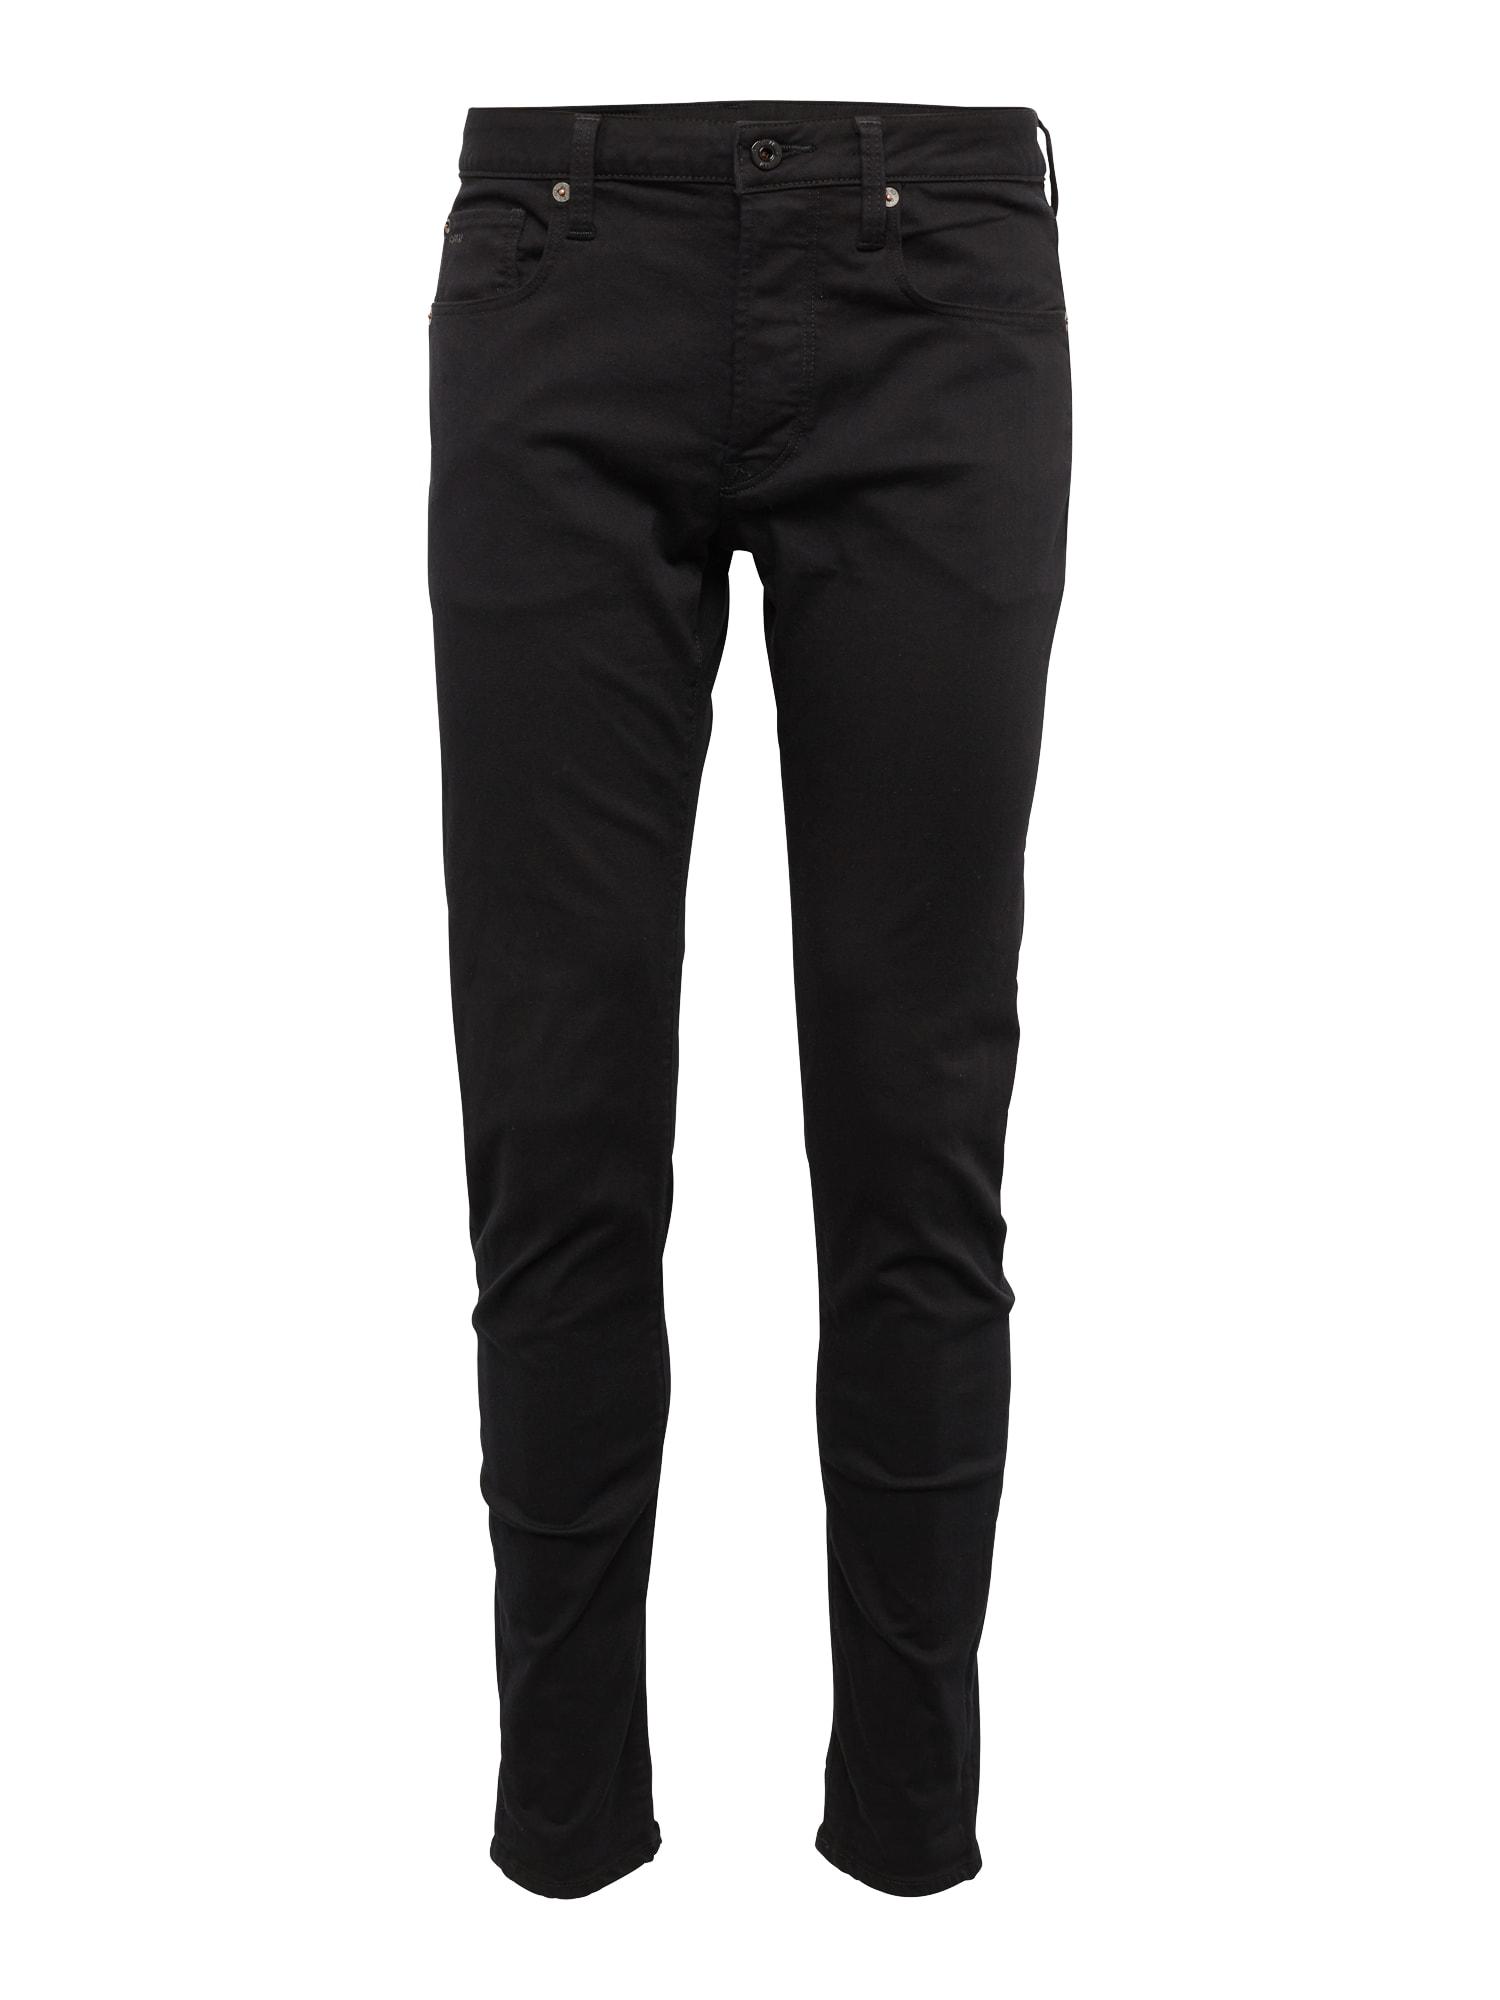 G-STAR RAW Heren Jeans 3301 Slim zwart